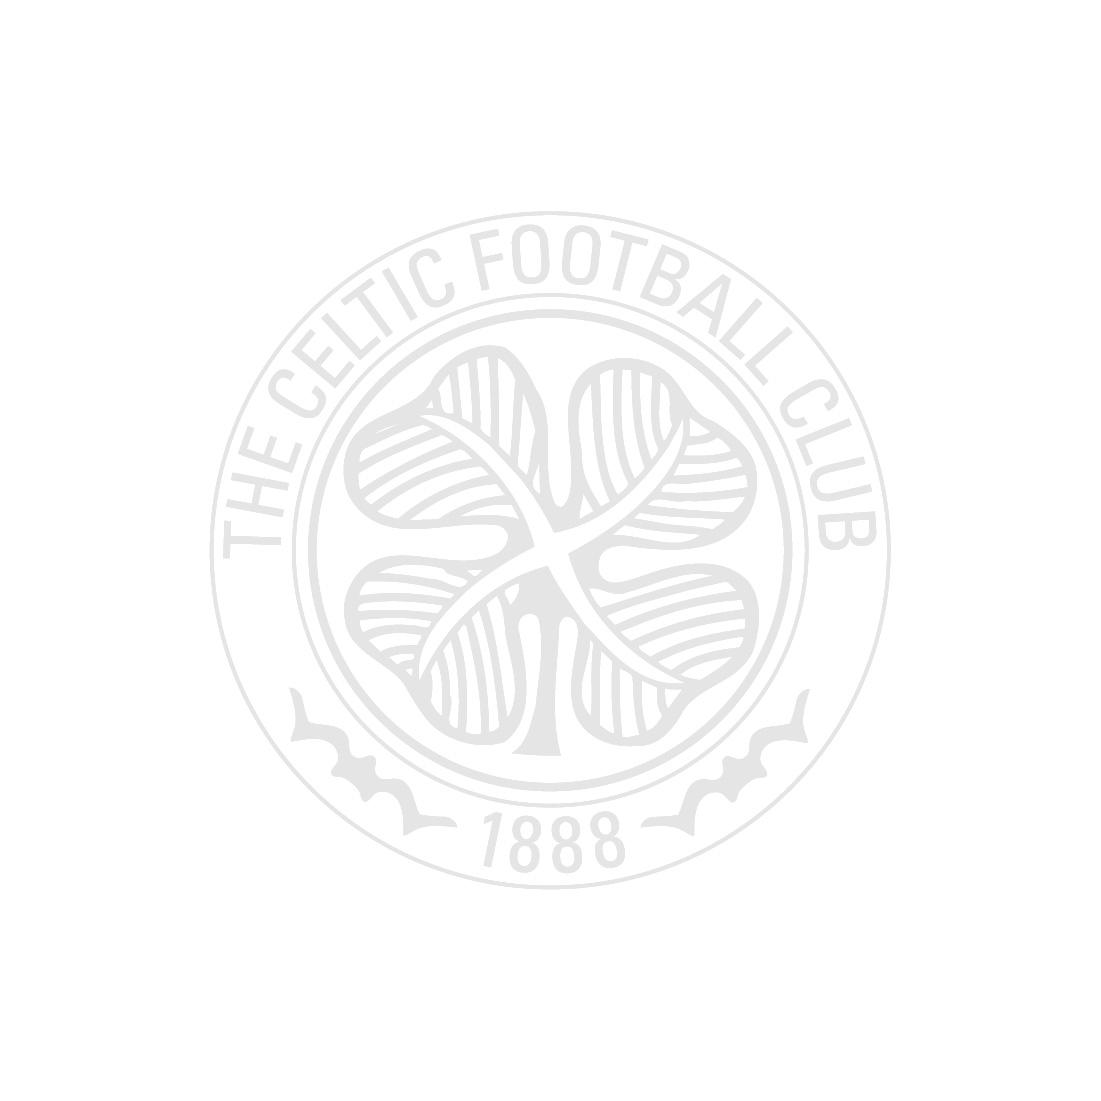 Celtic Inflatable Desk Seat - Online Exclusive